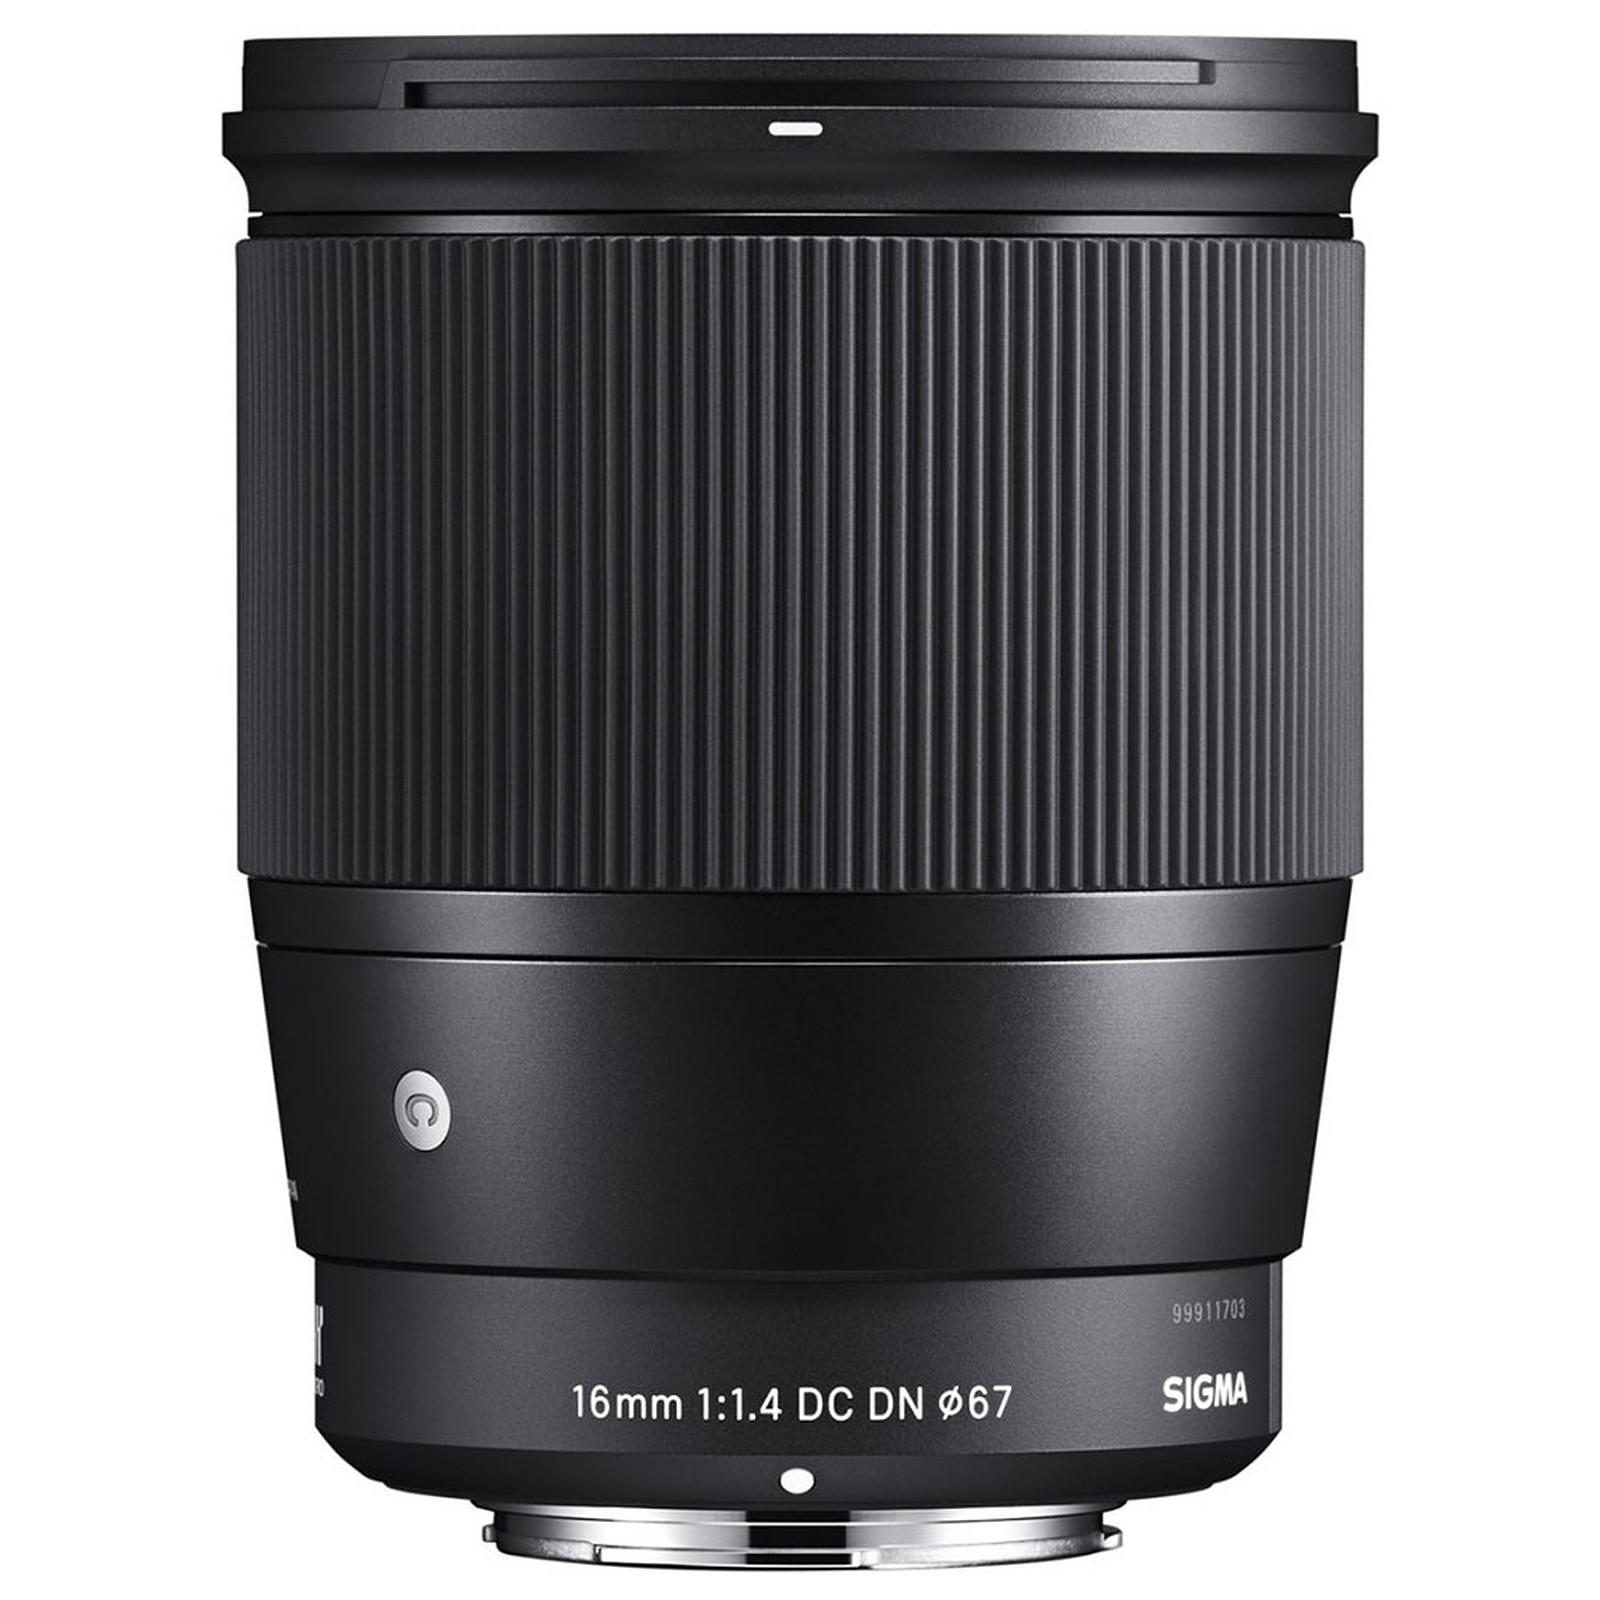 SIGMA 16mm F1.4 DC DN Noir monture Sony E